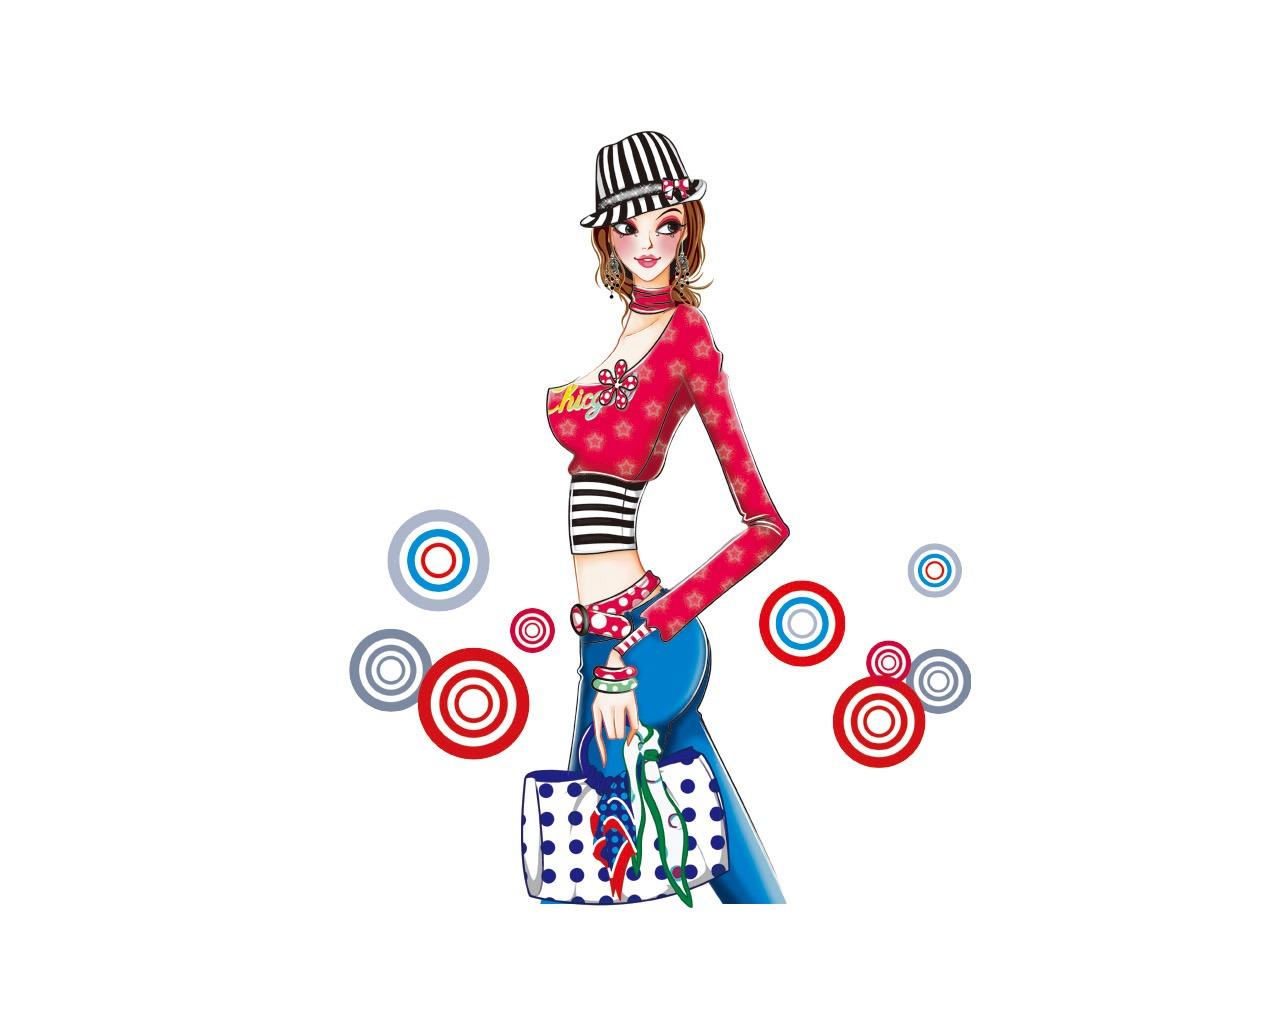 Vector Style Fashion Women Wallpaper 34 1280x1024 Wallpaper Download Vector Style Fashion